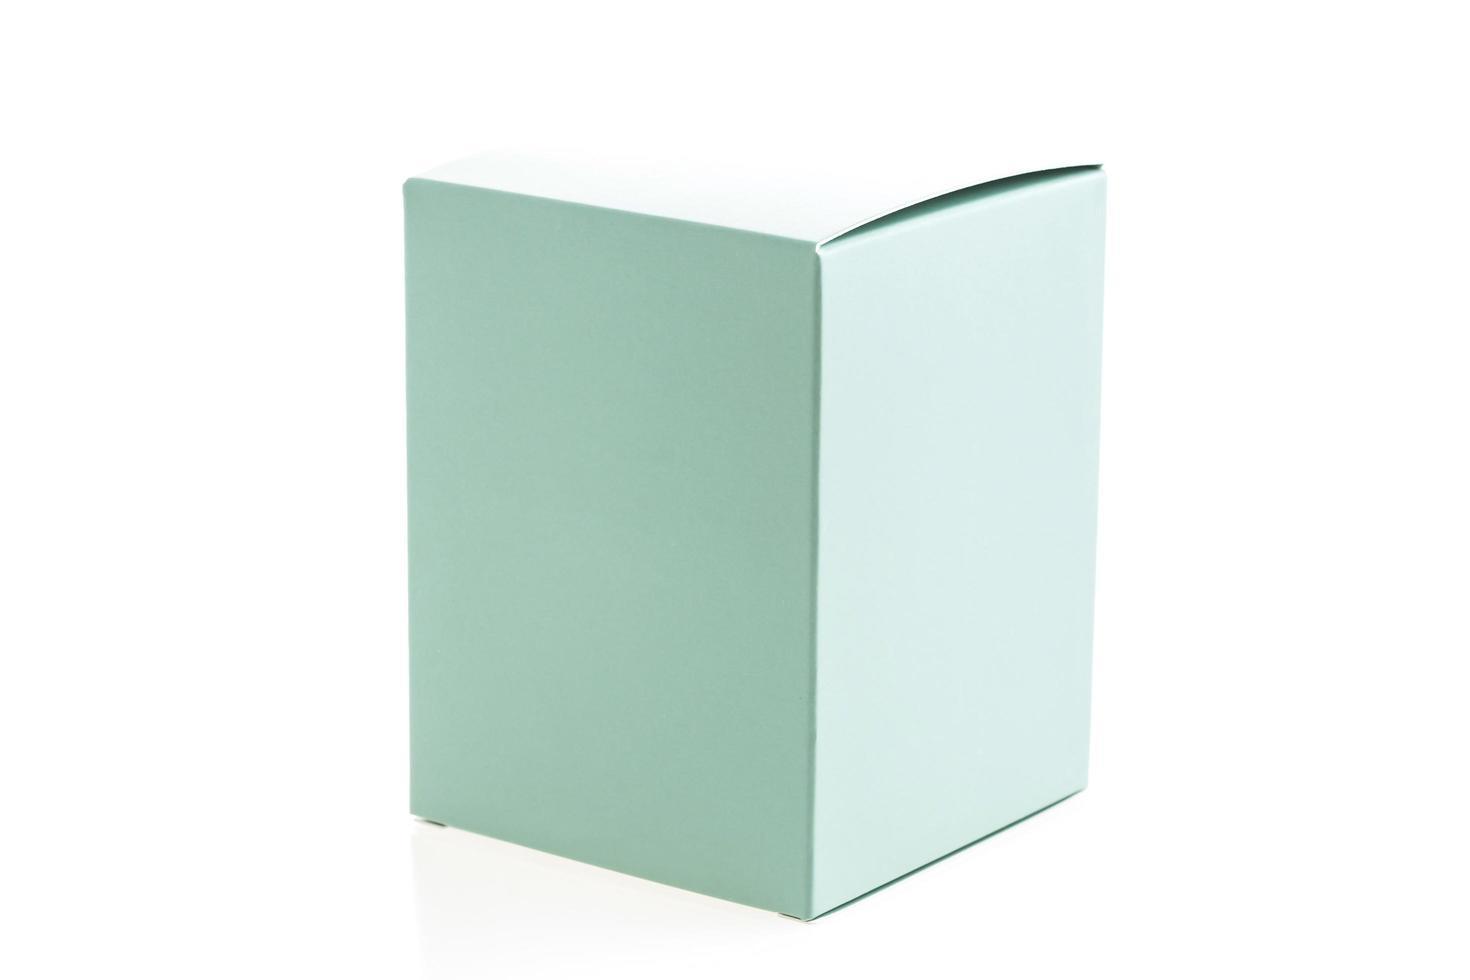 Mock up paper box photo